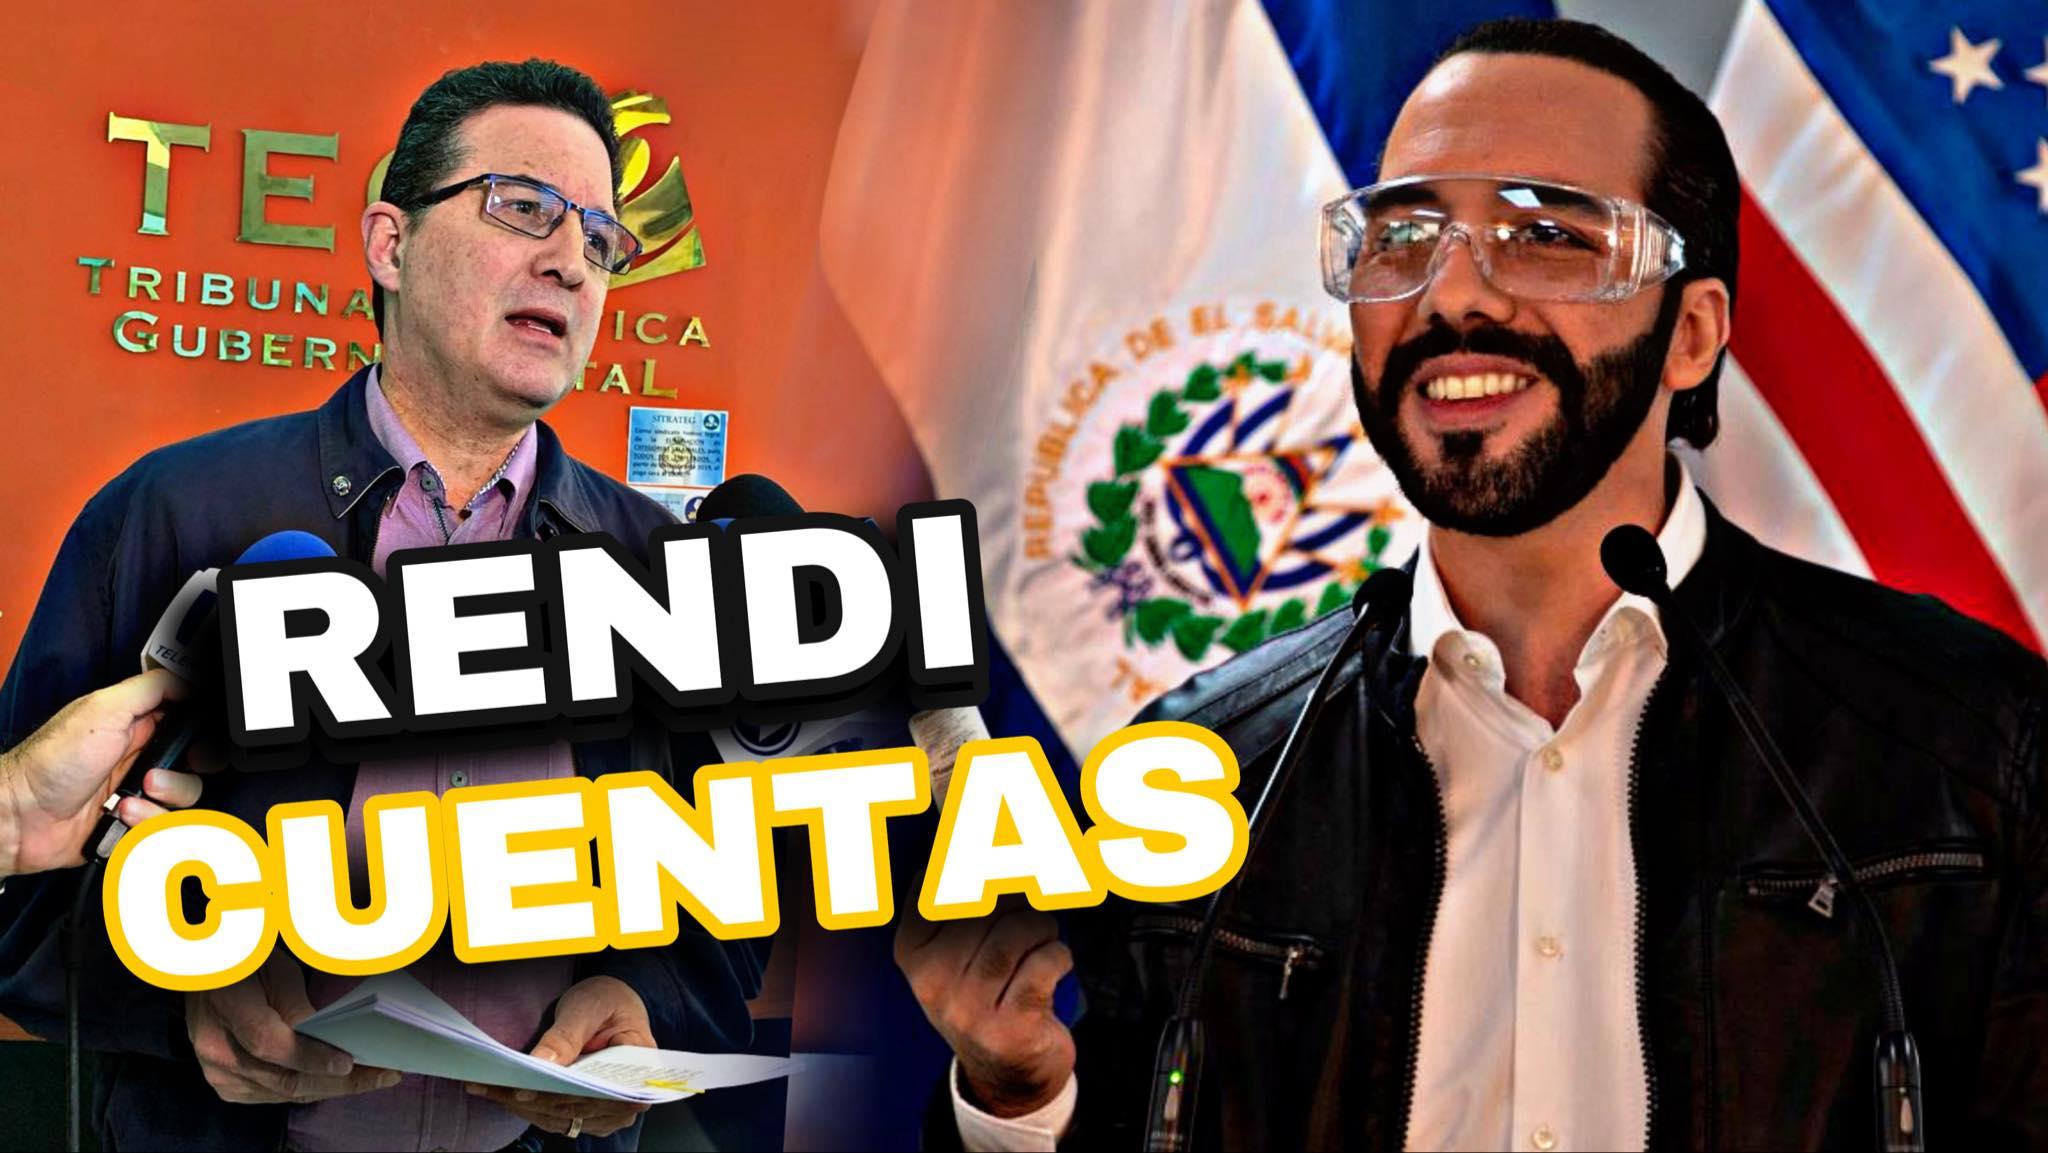 Juan Valiente Ex Dipurata Le Ordena Al Presidente Bukele